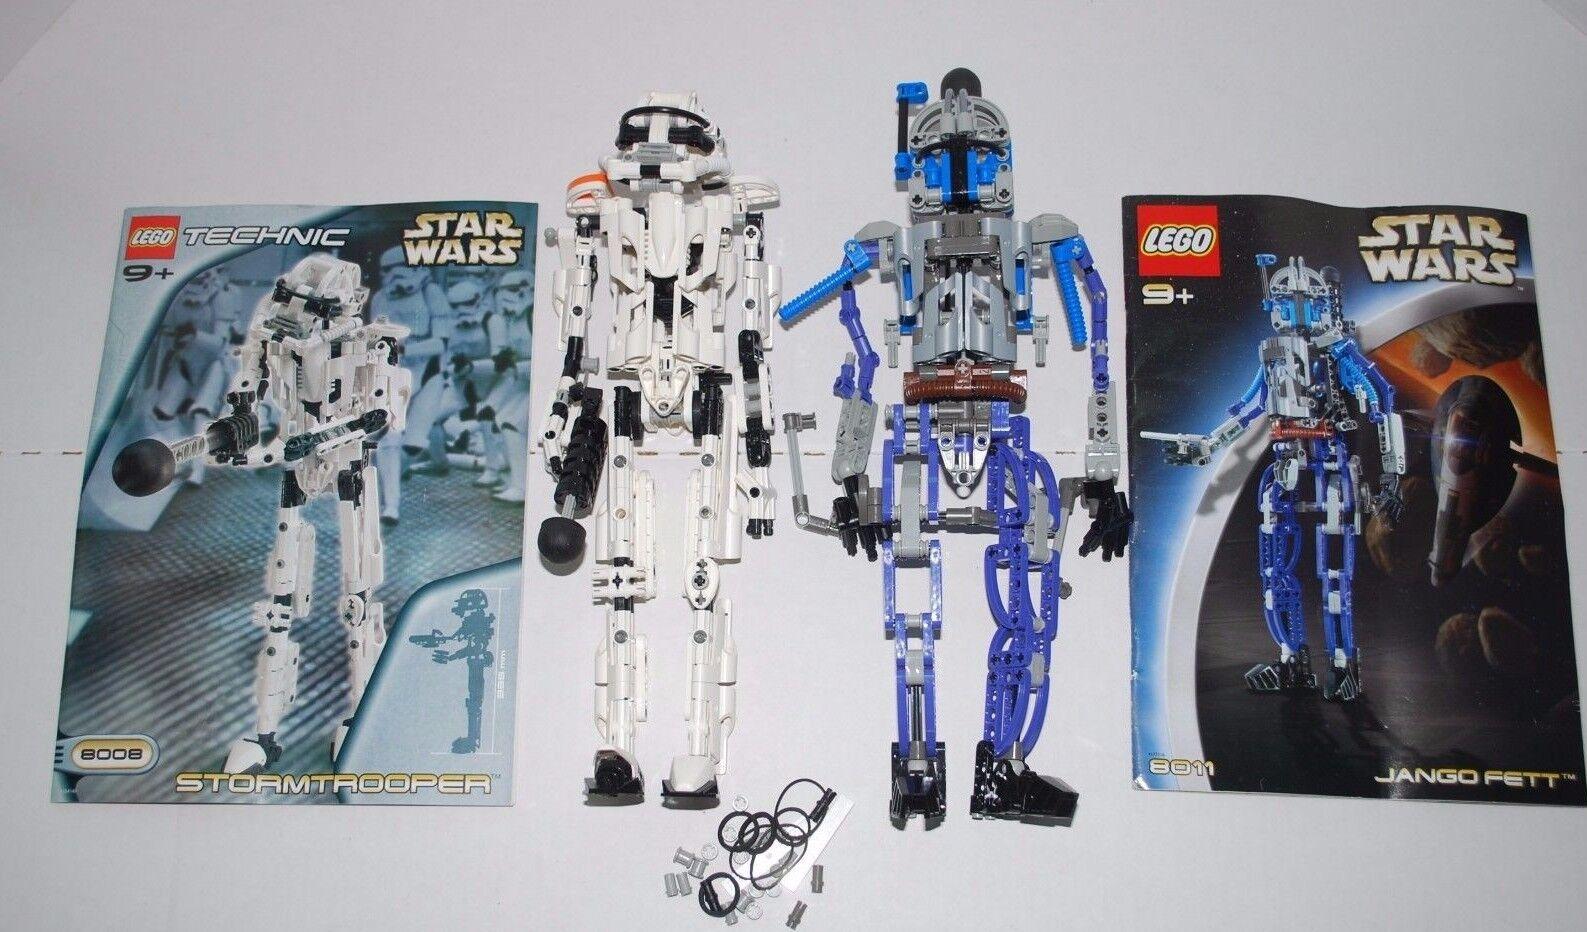 Lego Technic Star Wars Storm Trooper Jango Fett Manuals Toys AS IS